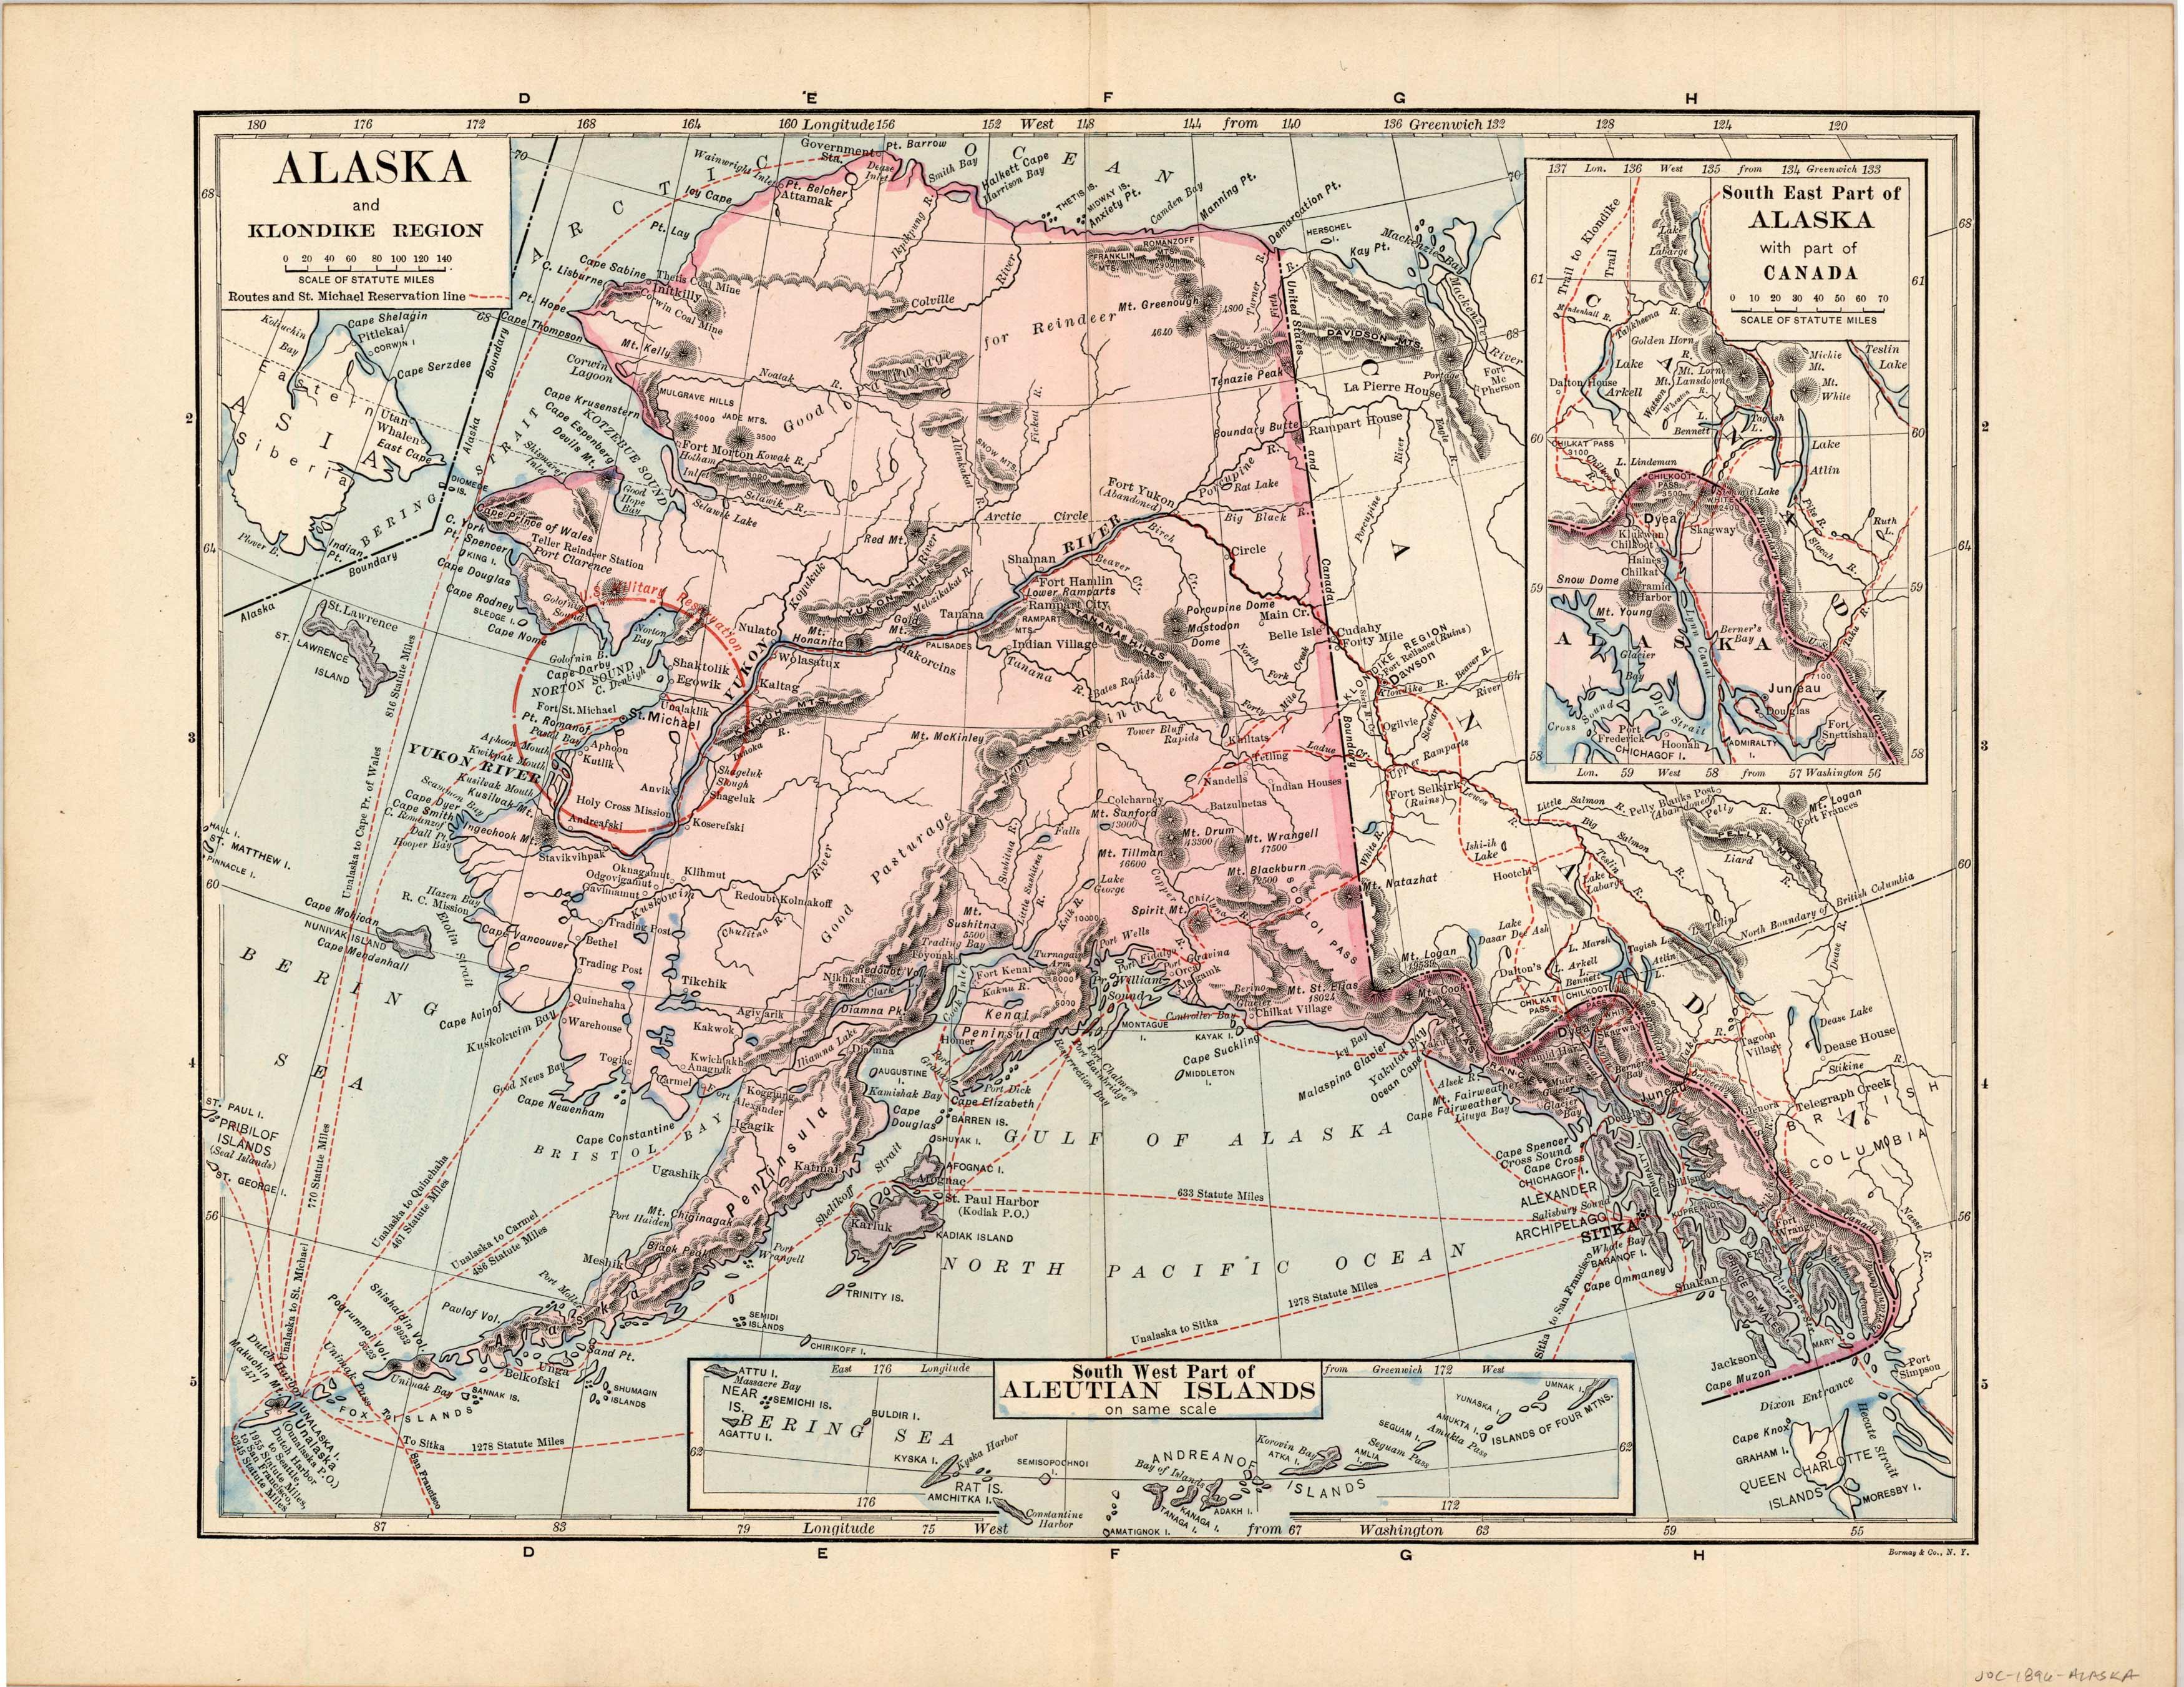 Alaska and Aleutian Islands